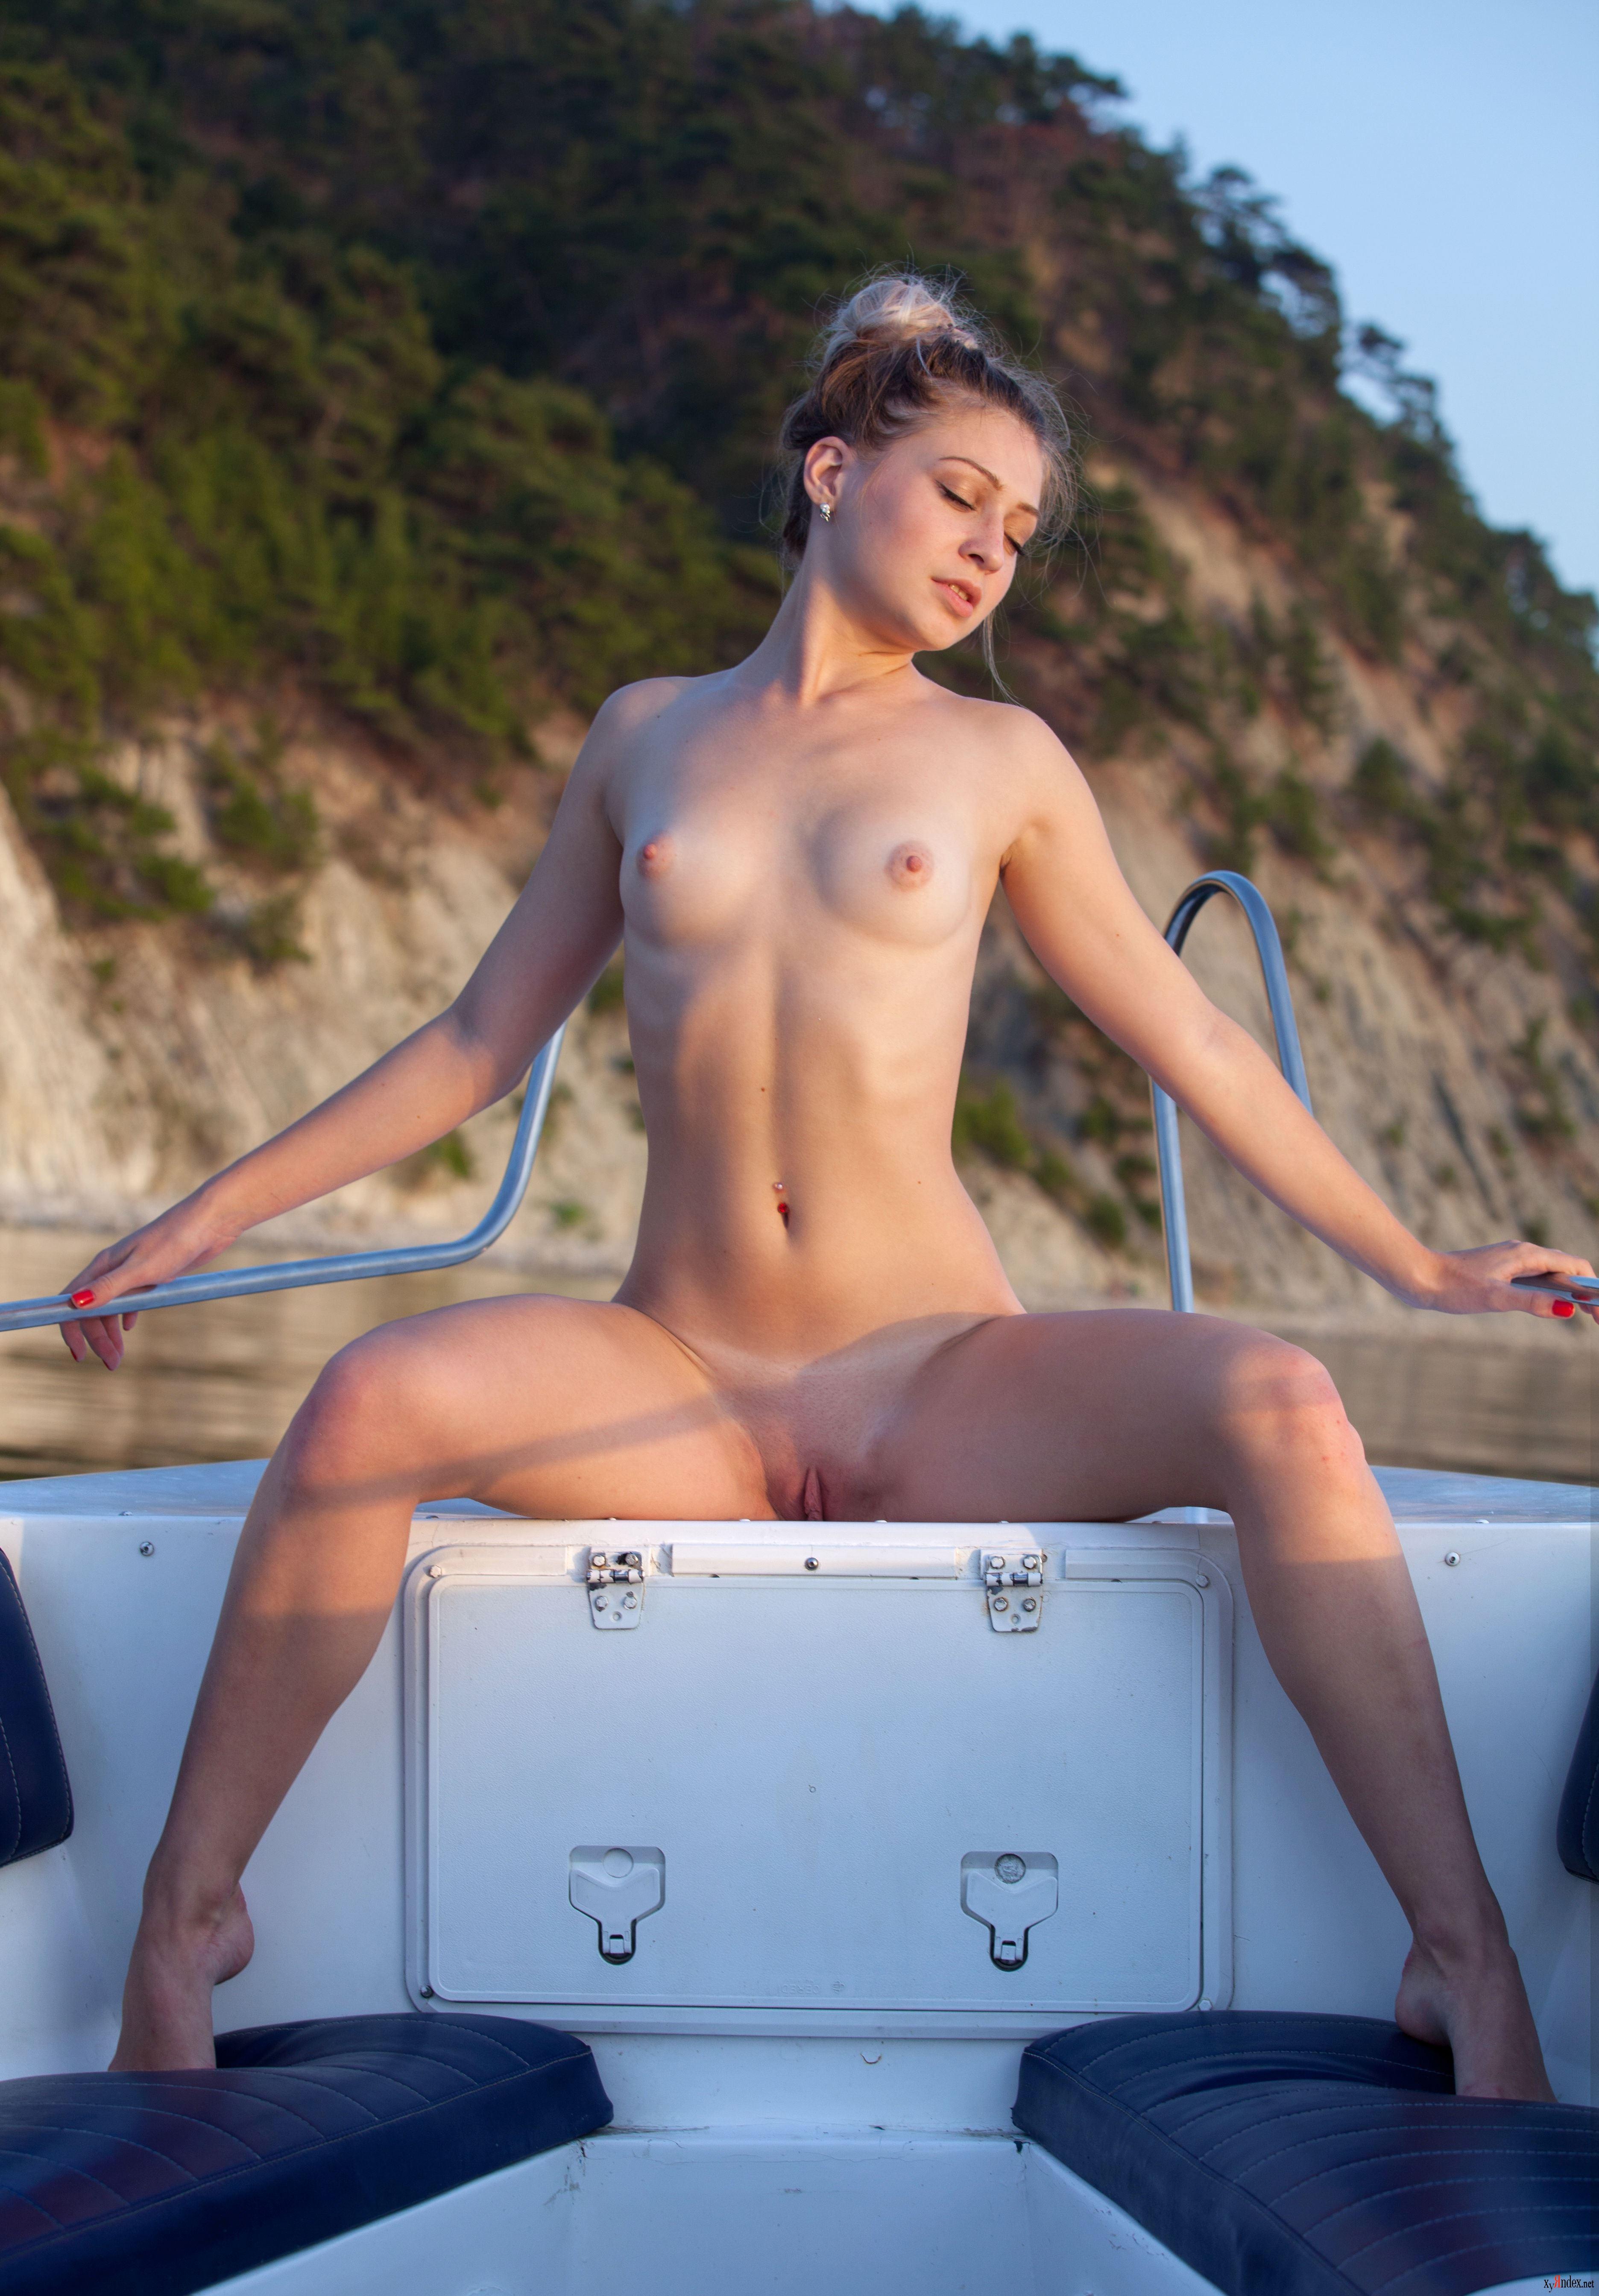 Shelby welinder nude